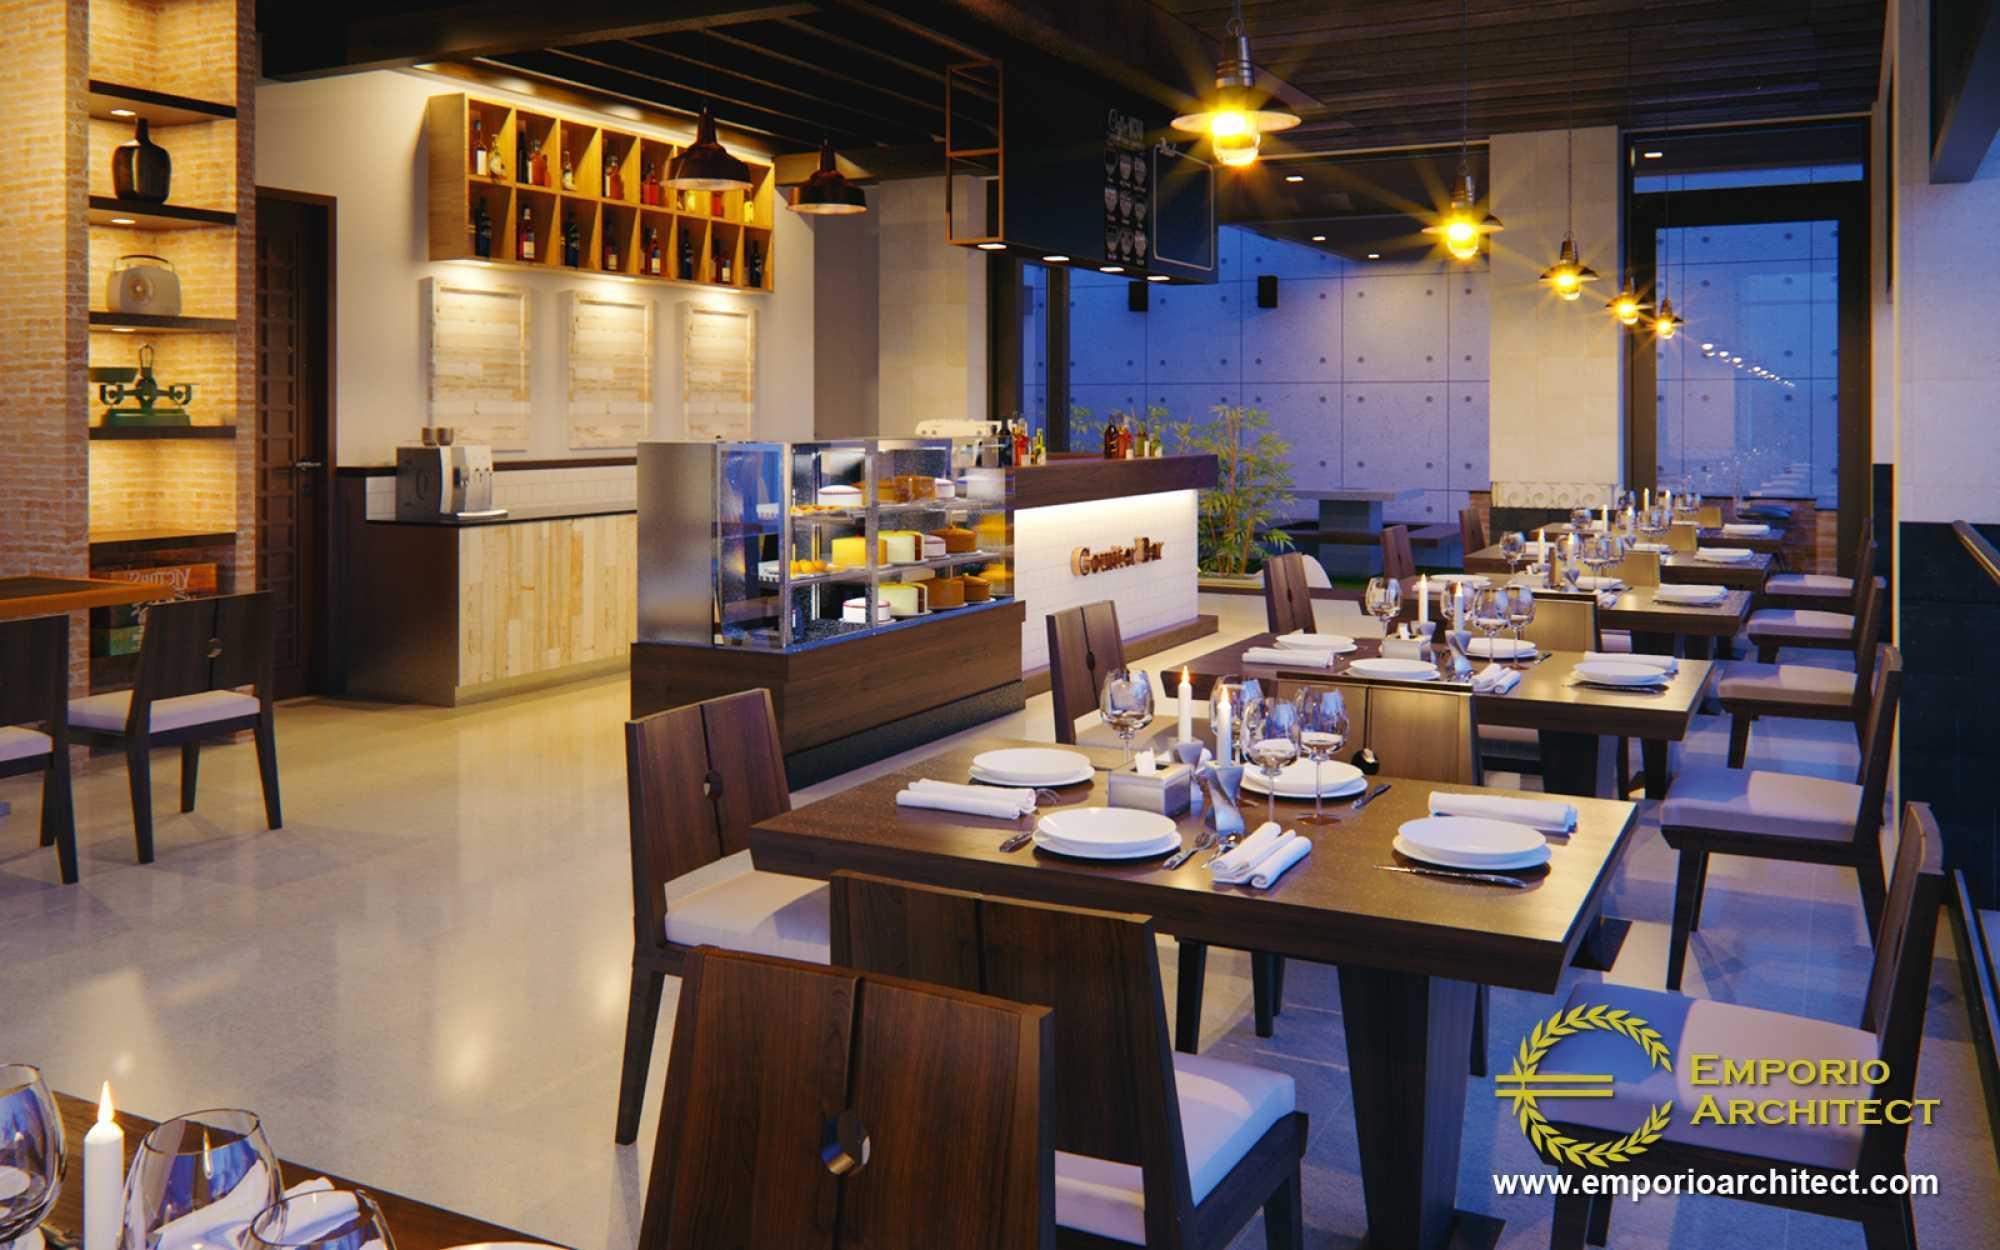 Emporio Architect Desain Hostel Villa Bali Tropis 311 @ Berawa, Canggu, Bali A Branch Of Serenity Eco Guesthouse, Just 2.6 Km Away, Canggu, Badung, Kabupaten Badung, Bali 80361, Indonesia A Branch Of Serenity Eco Guesthouse, Just 2.6 Km Away, Canggu, Badung, Kabupaten Badung, Bali 80361, Indonesia Emporio-Architect-Desain-Hostel-Villa-Bali-Tropis-311-Berawa-Canggu-Bali  74008